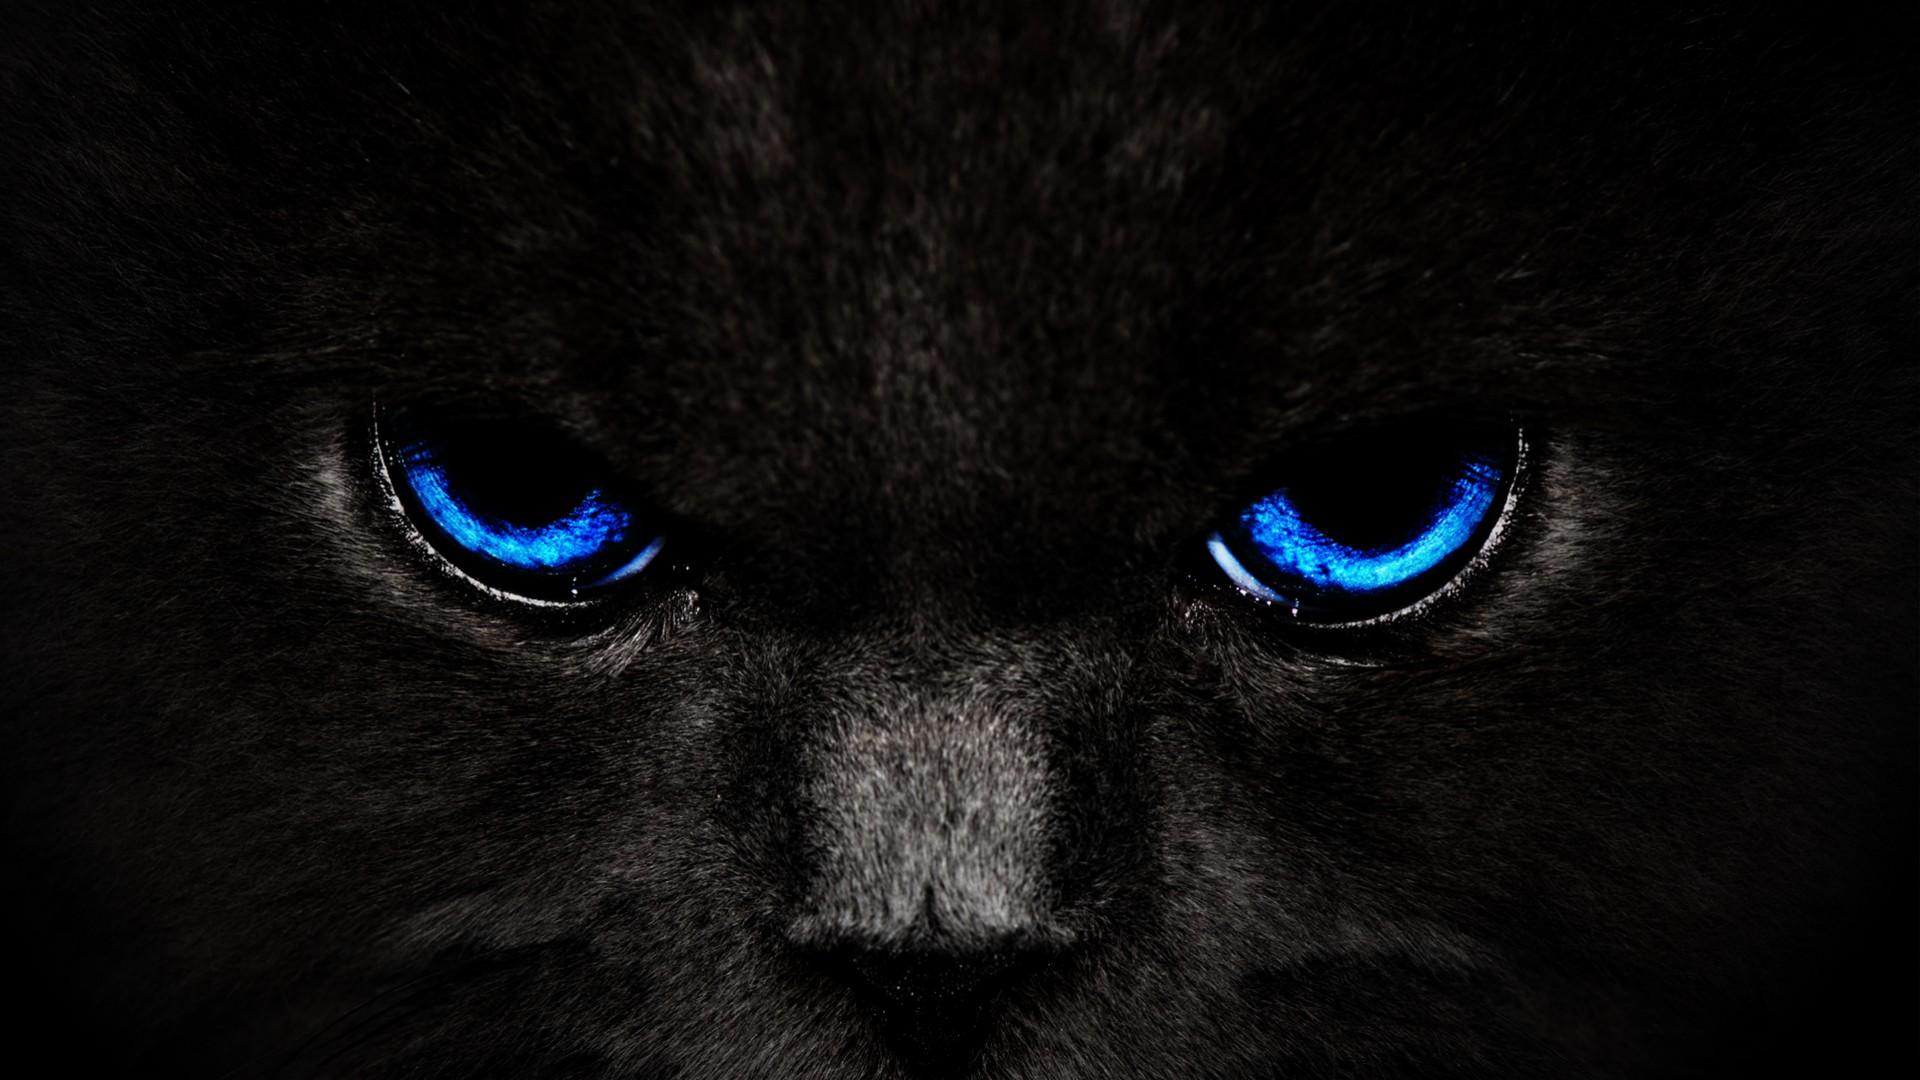 Hd wallpaper cat - Download Cat Blue Eyes Free Wallpaper 1920x1080 Full Hd Wallpapers